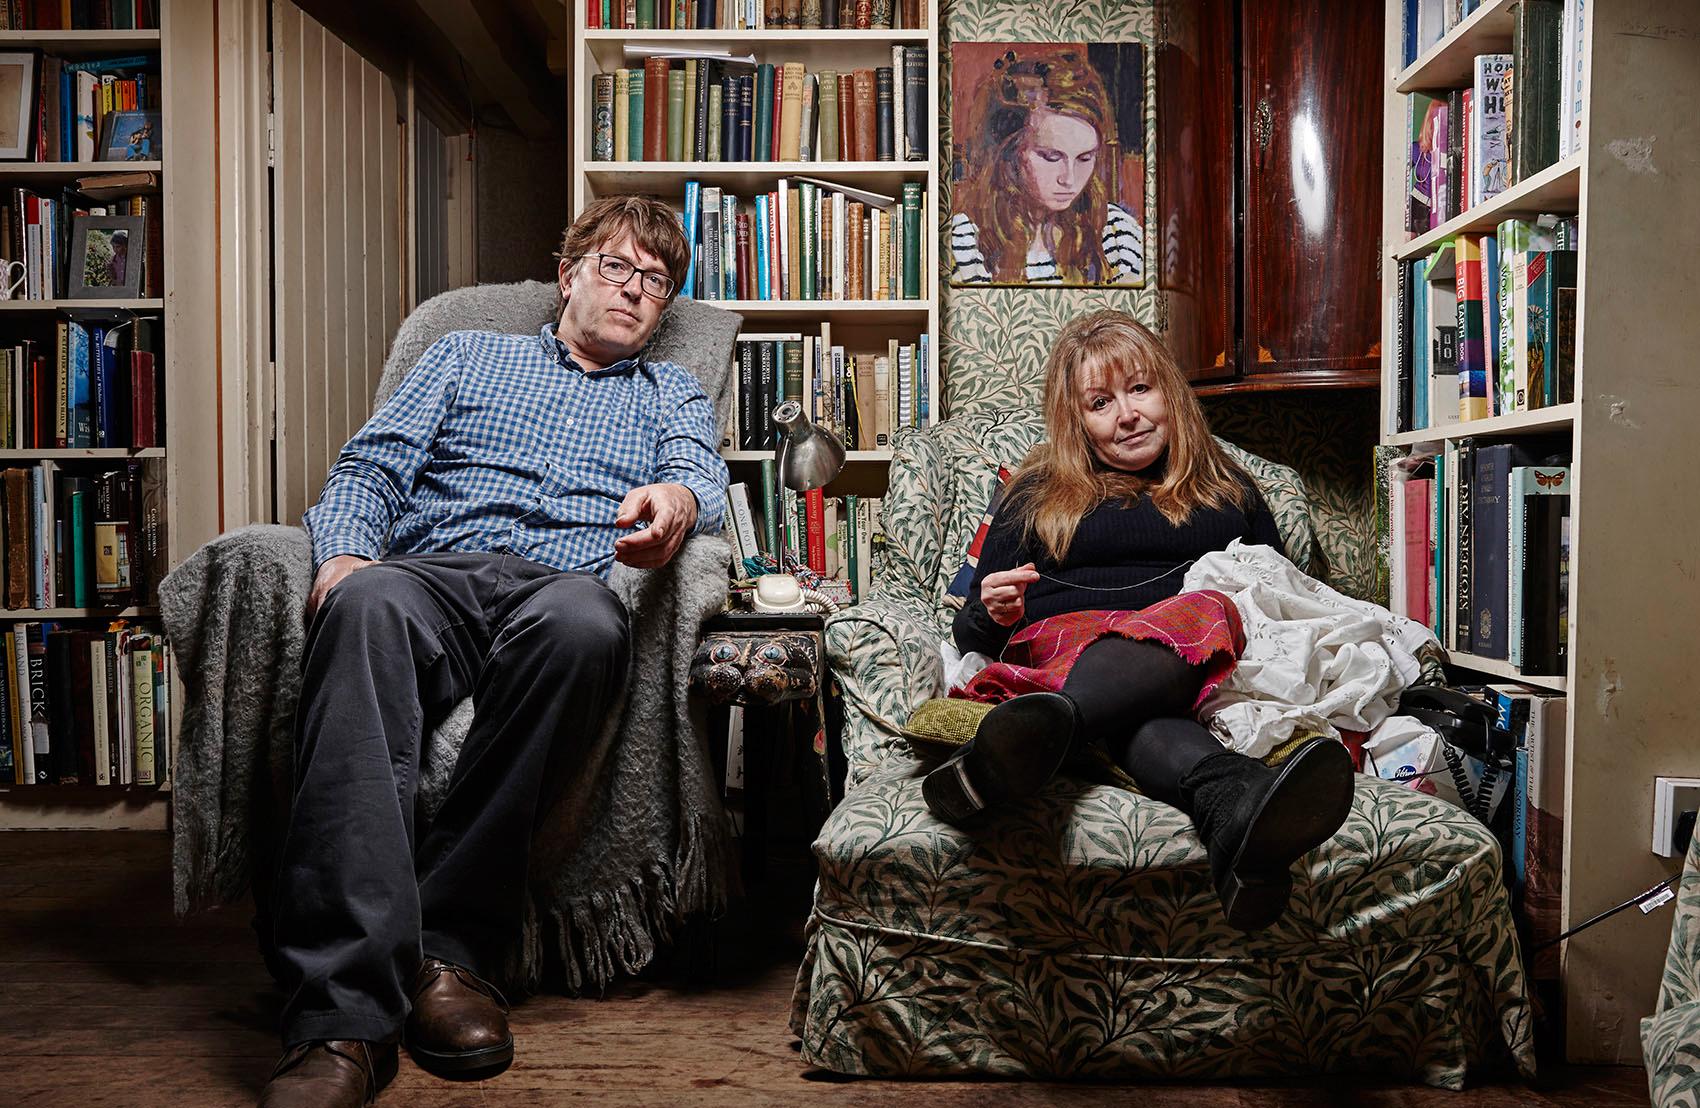 Giles-and--Mary-Gogglebox6359RT-HP-2.jpg